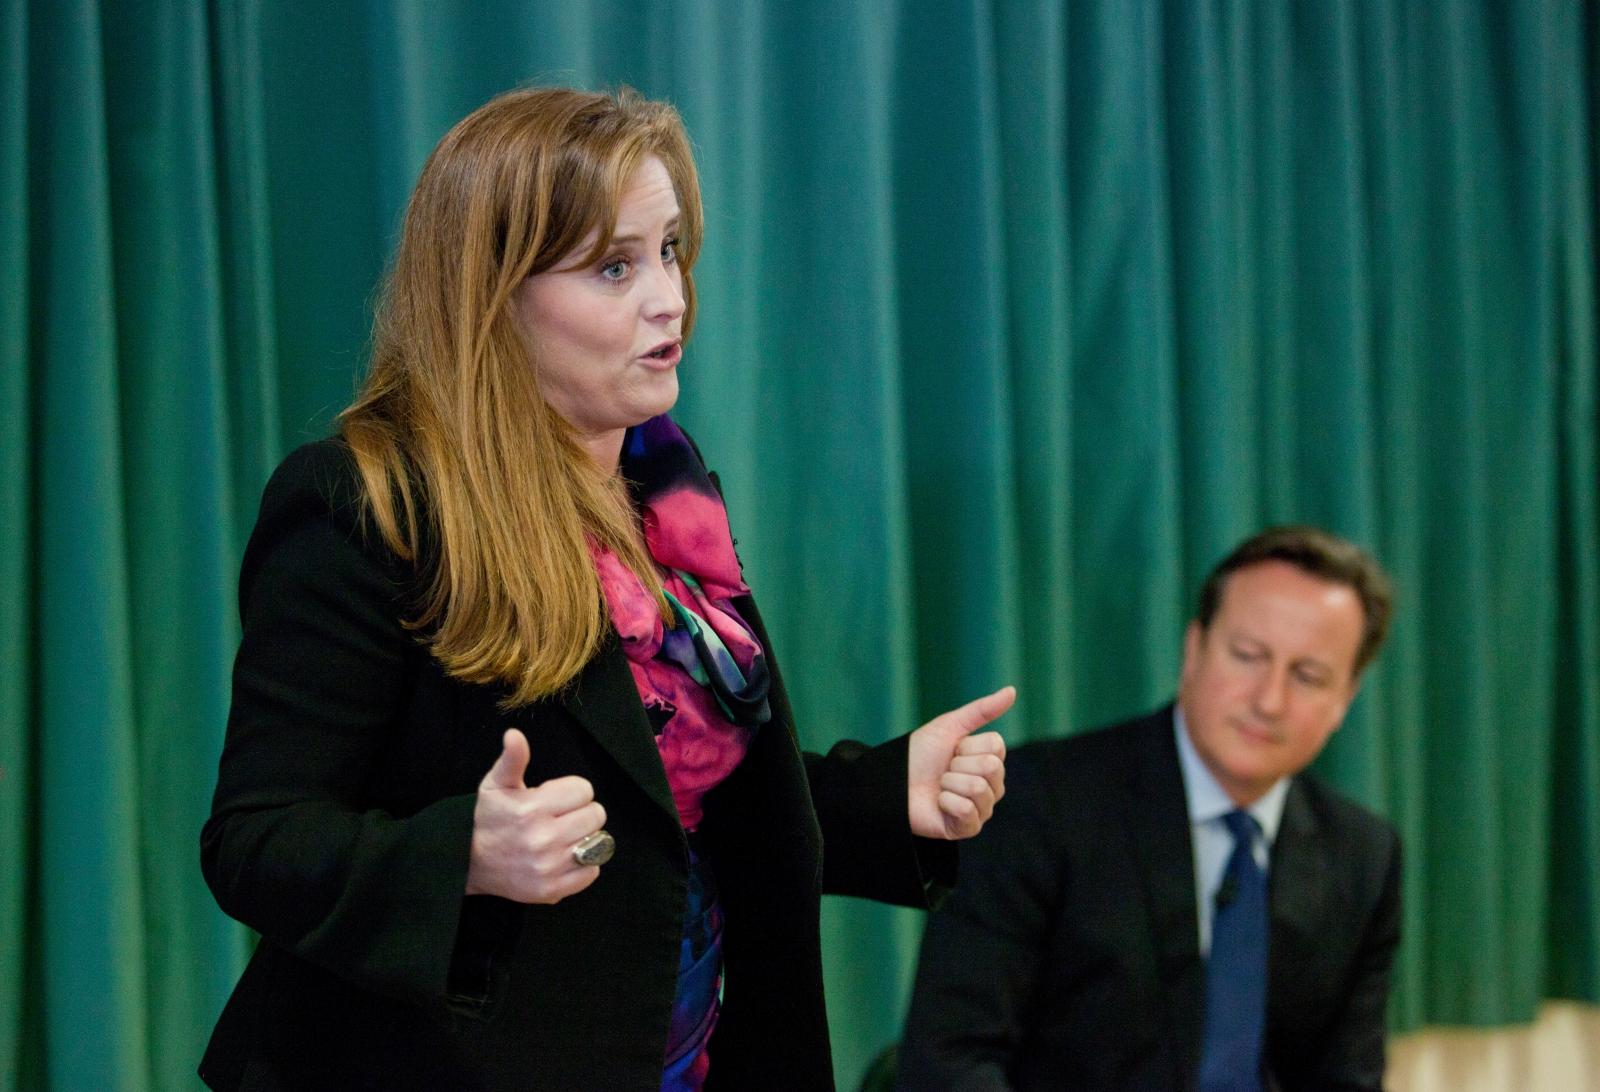 Kelly Tolhurst and David Cameron